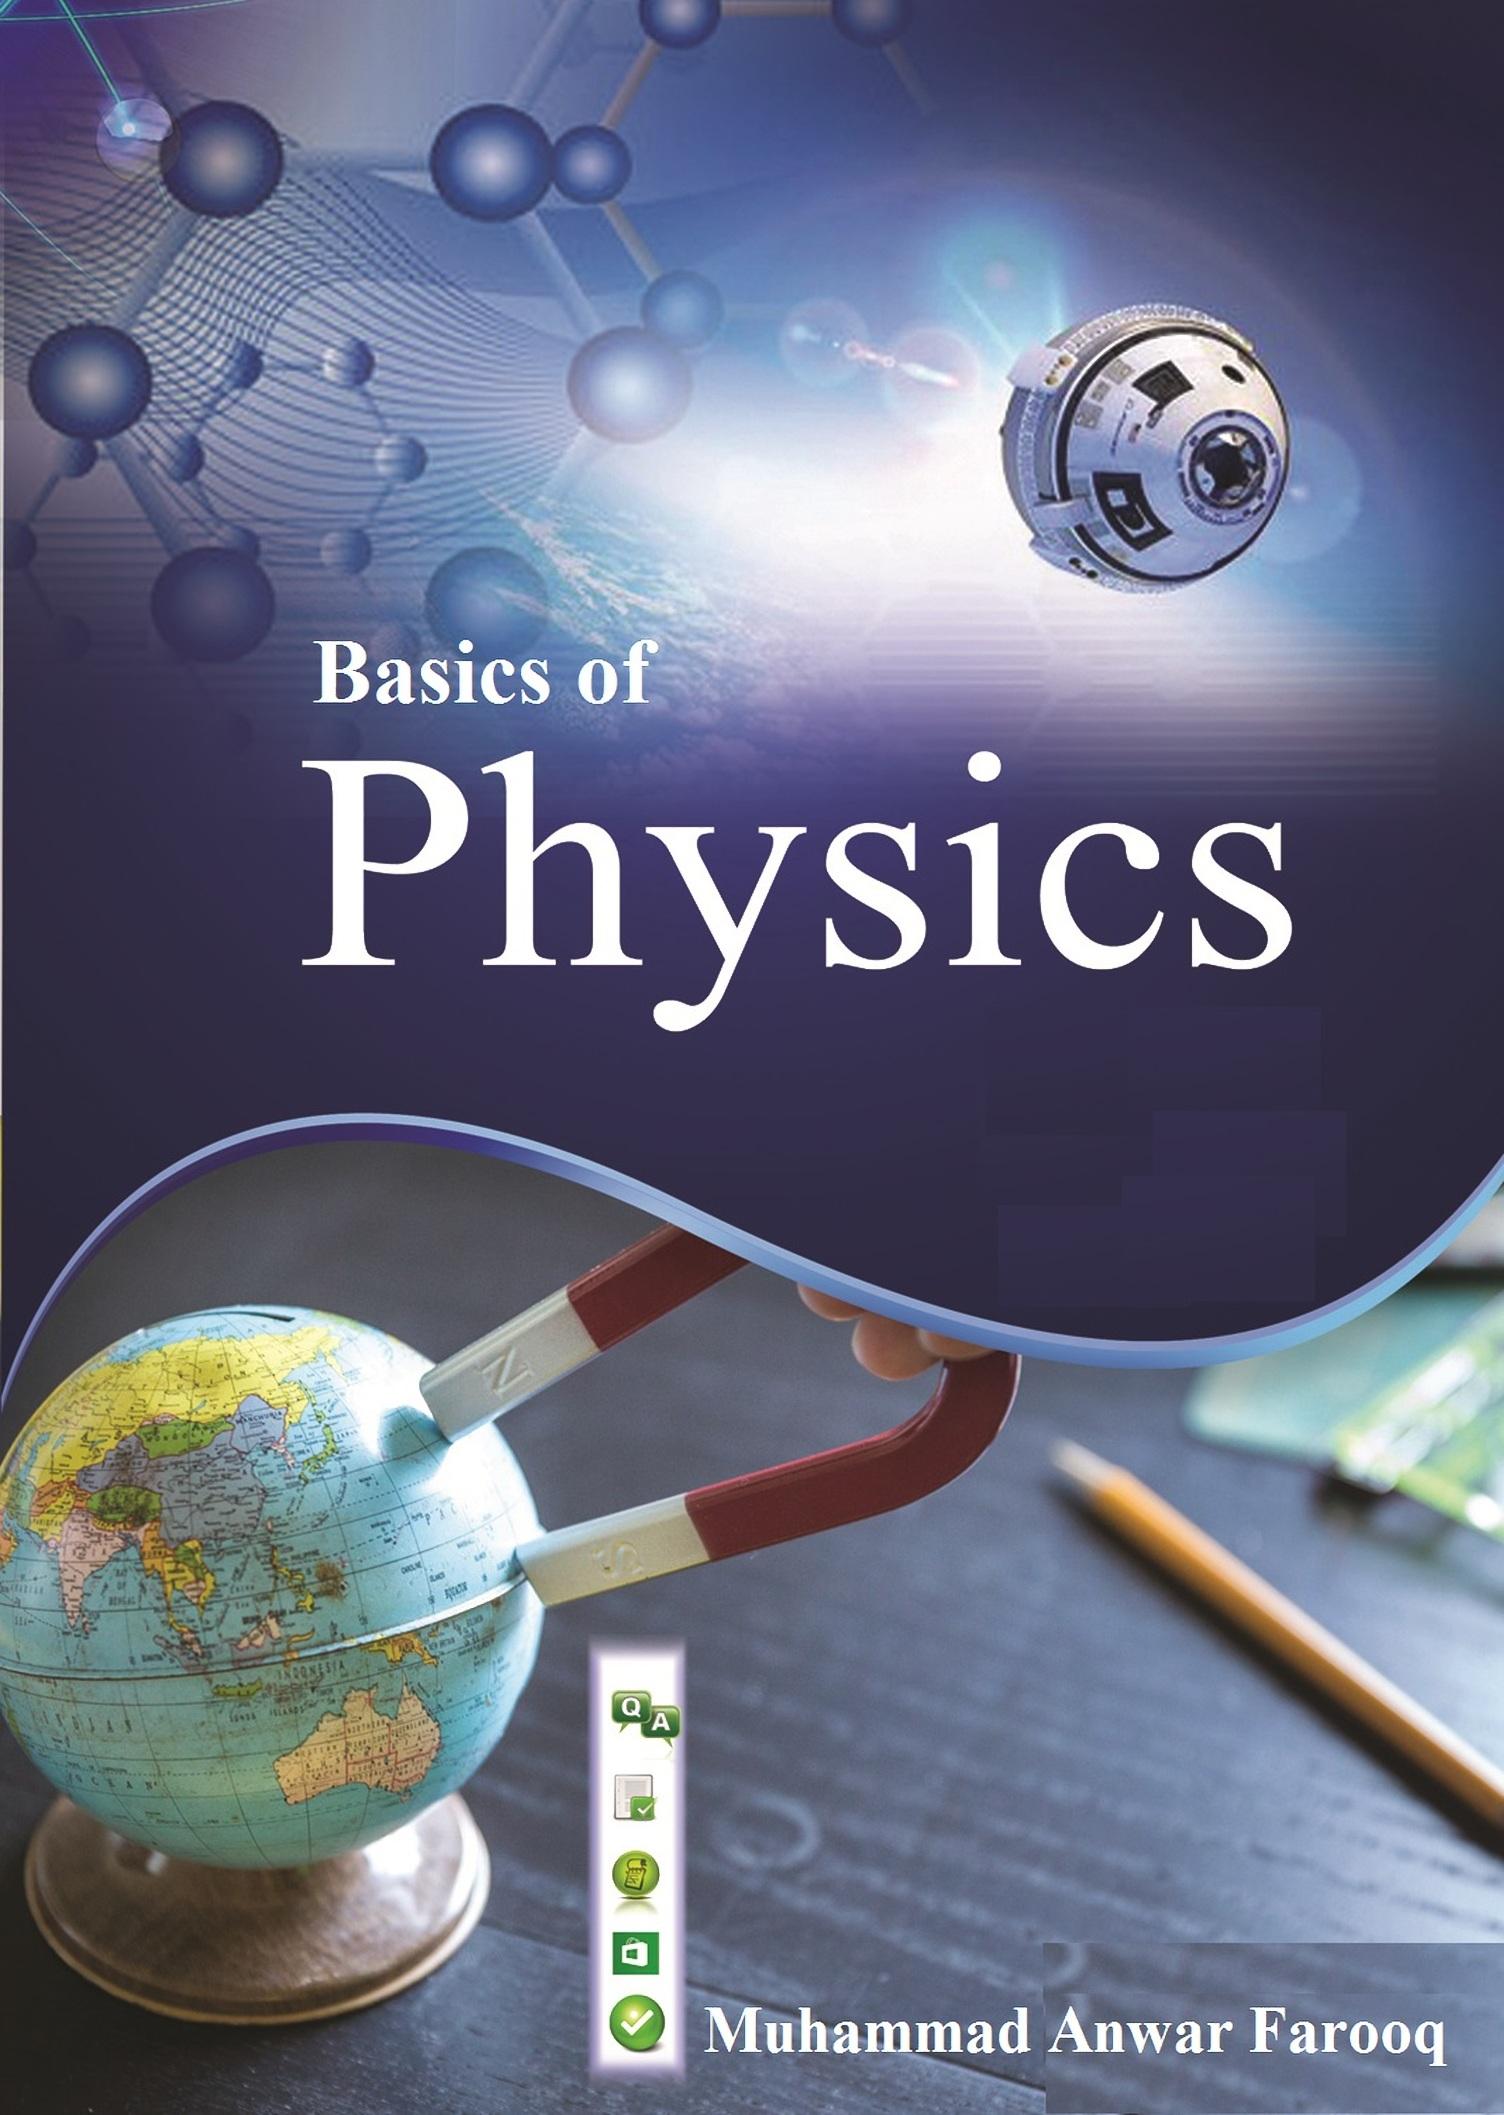 Physics From The Basics Ebook